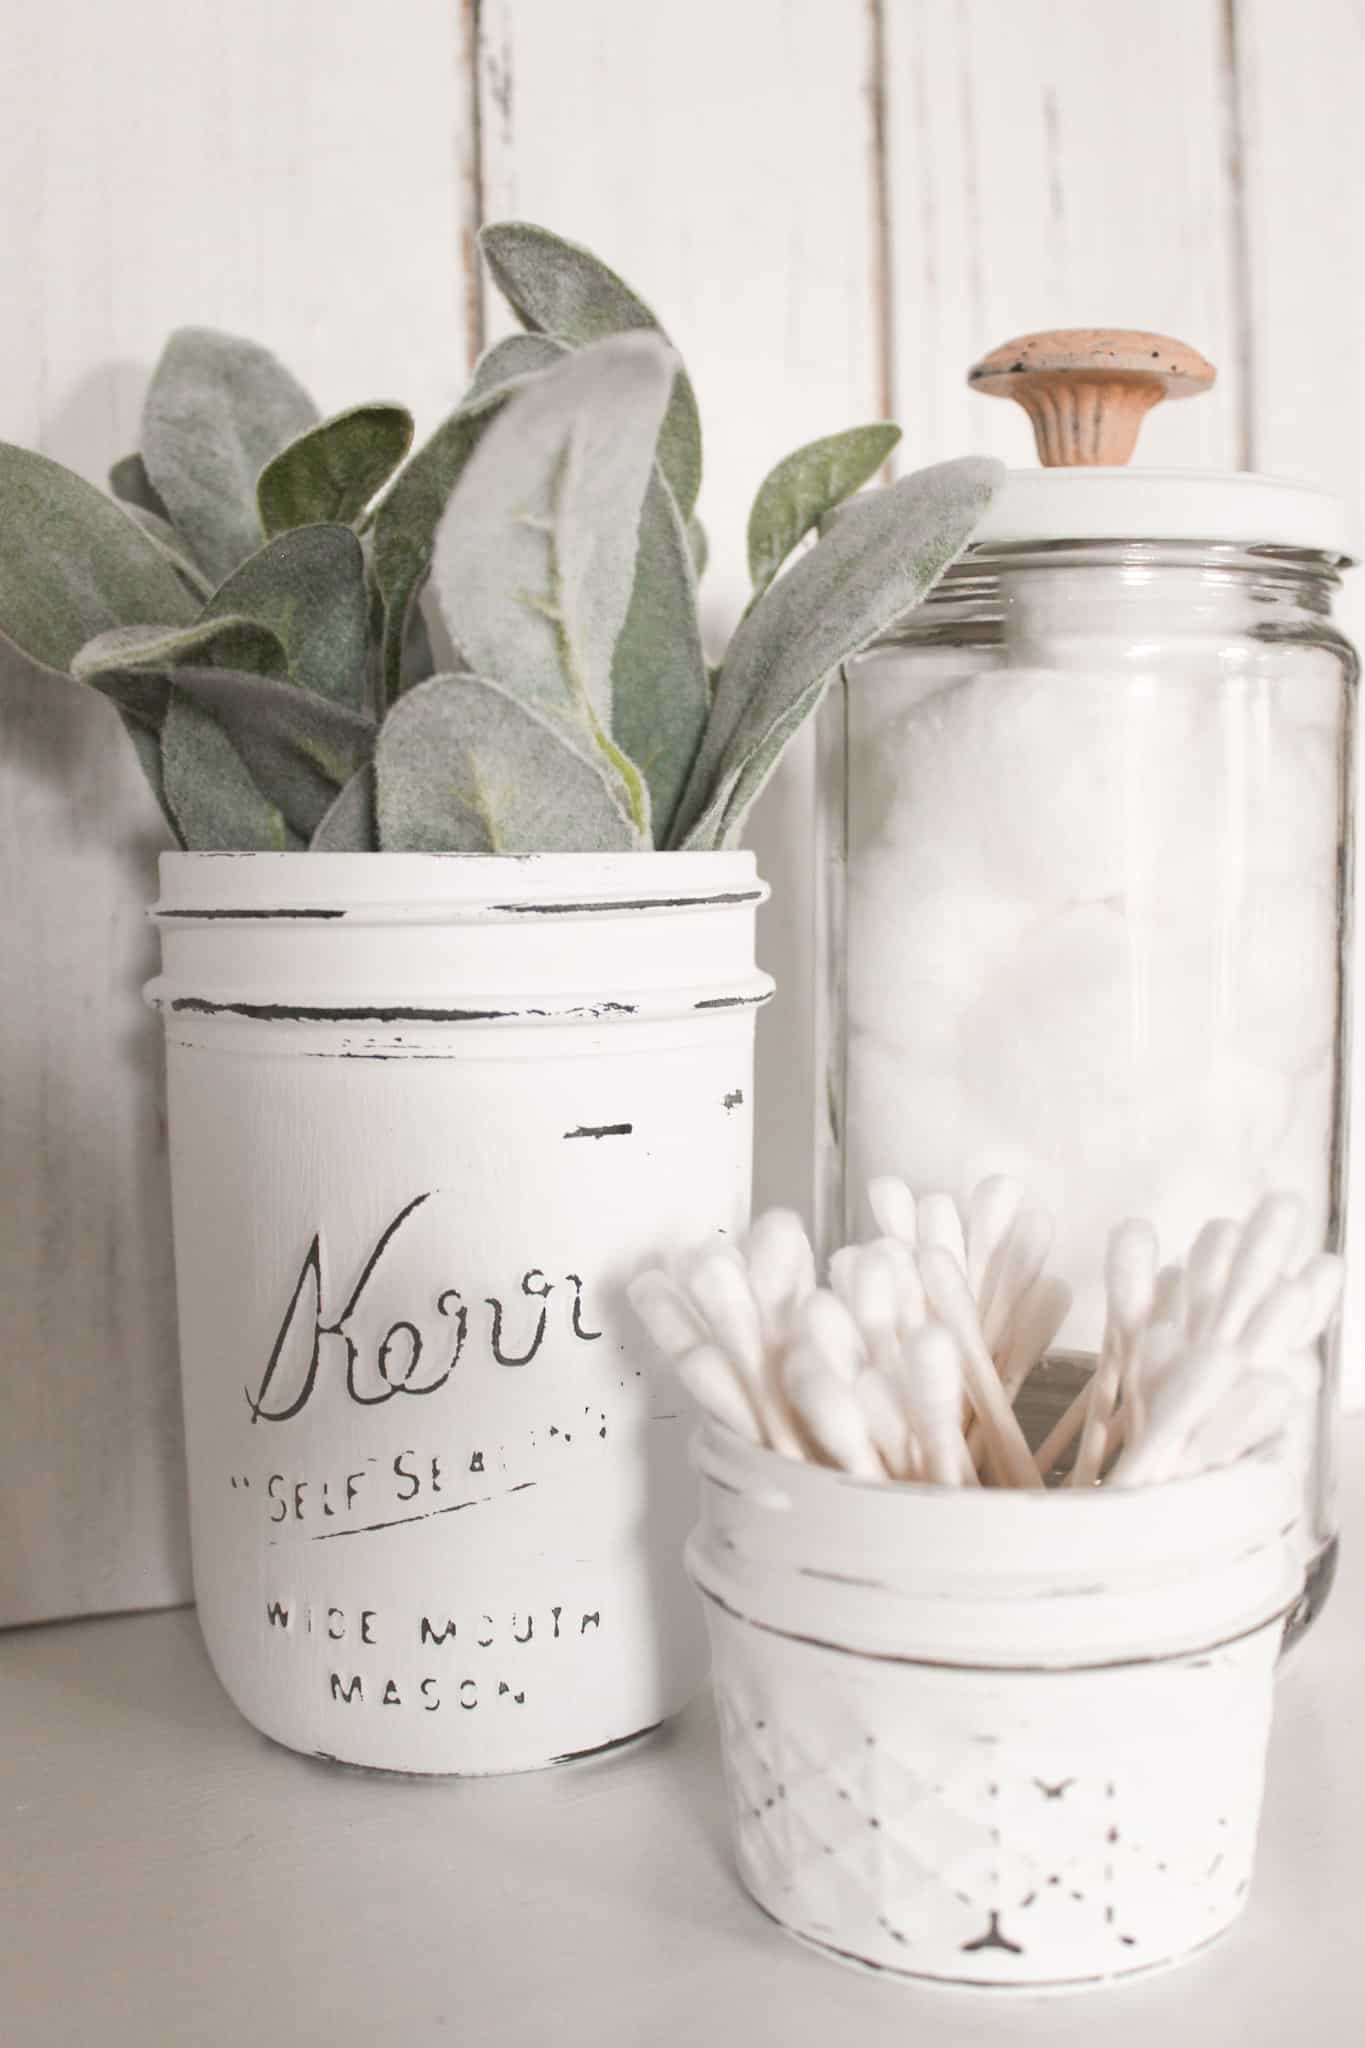 Repurposed Glass Jar Organizers for Bathroom Essentials